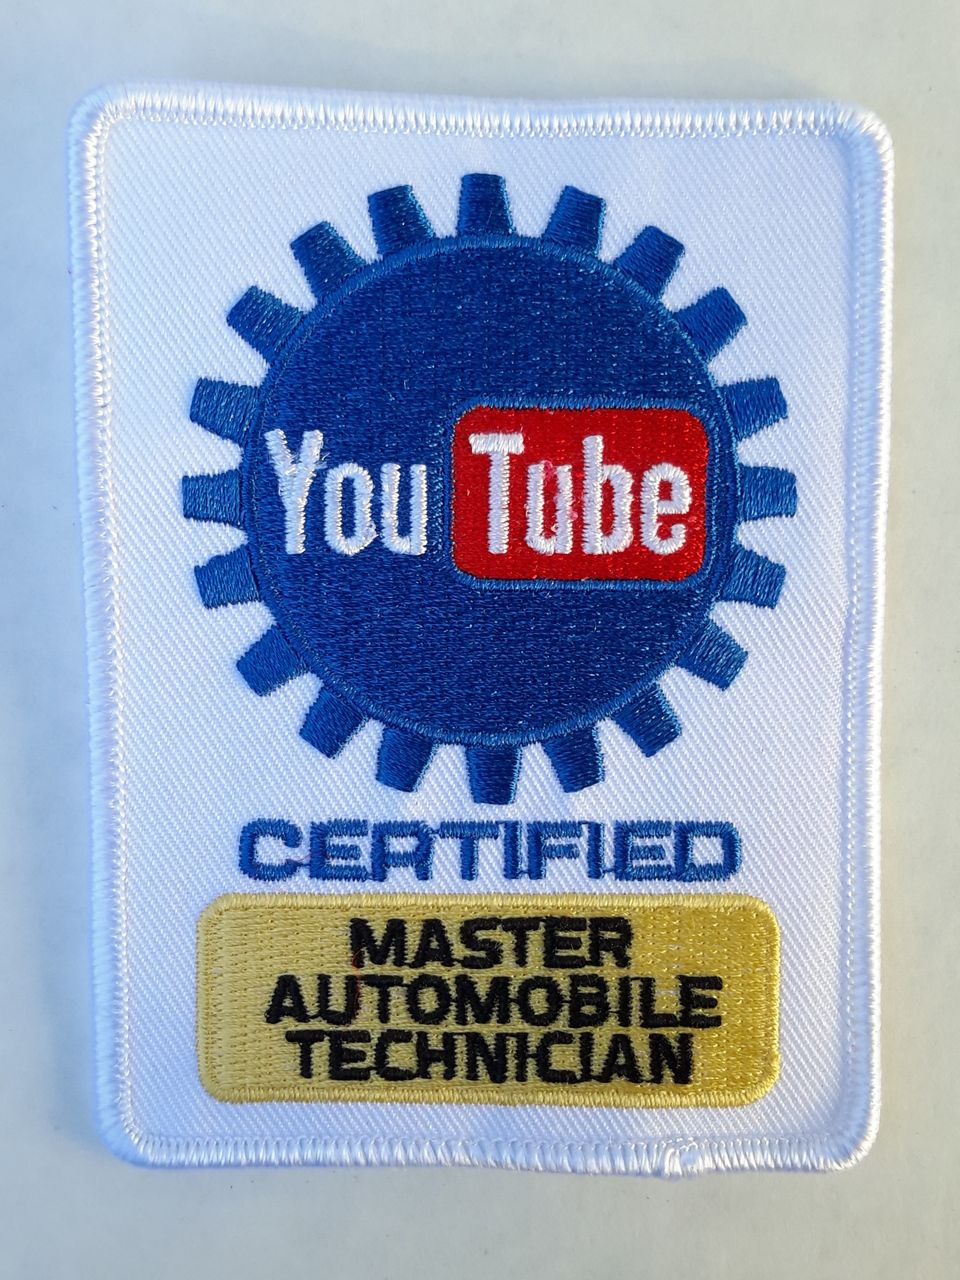 Youtube Certified Master Automobile Technician Mechanic Patch